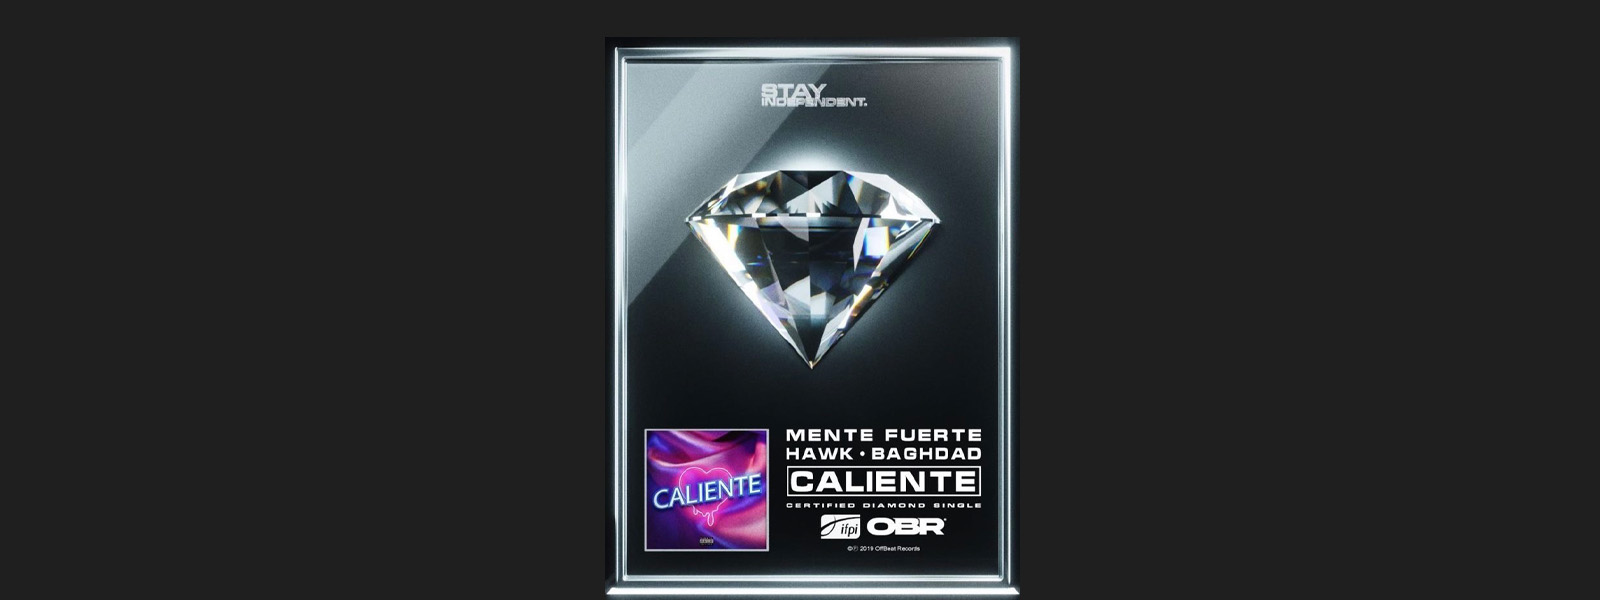 """Caliente"" Awarded First-Ever IFPI Certified Diamond Single In Greece"